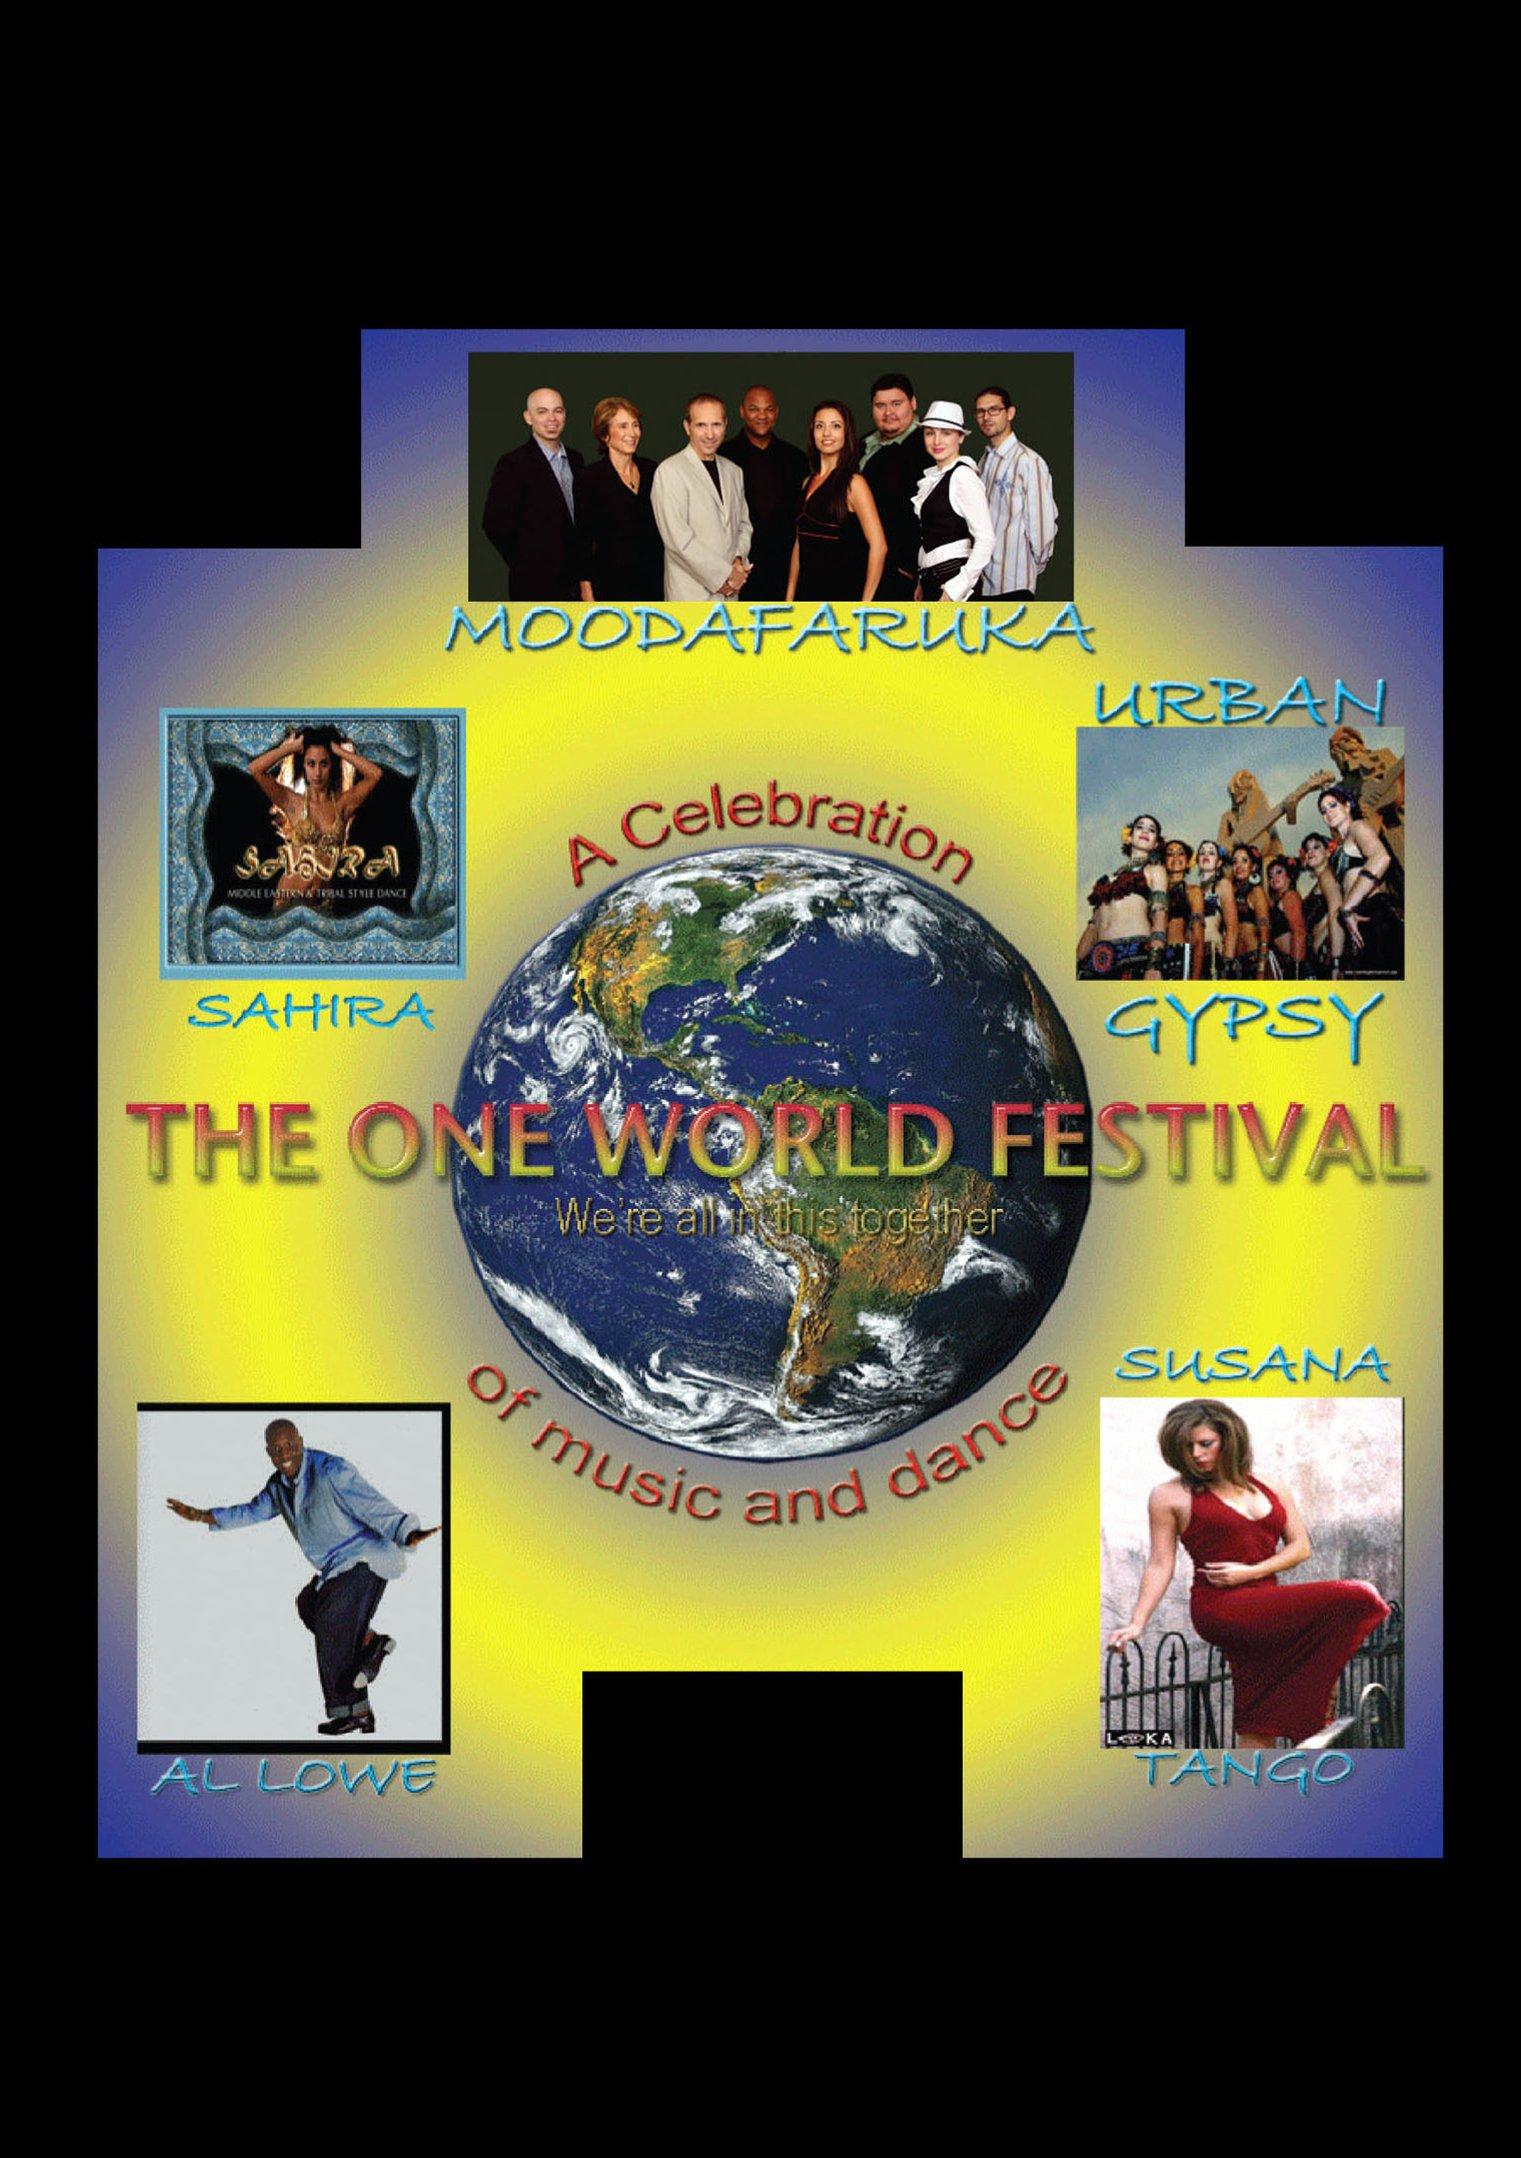 DVD : Moodafaruka - One World Festival (DVD)